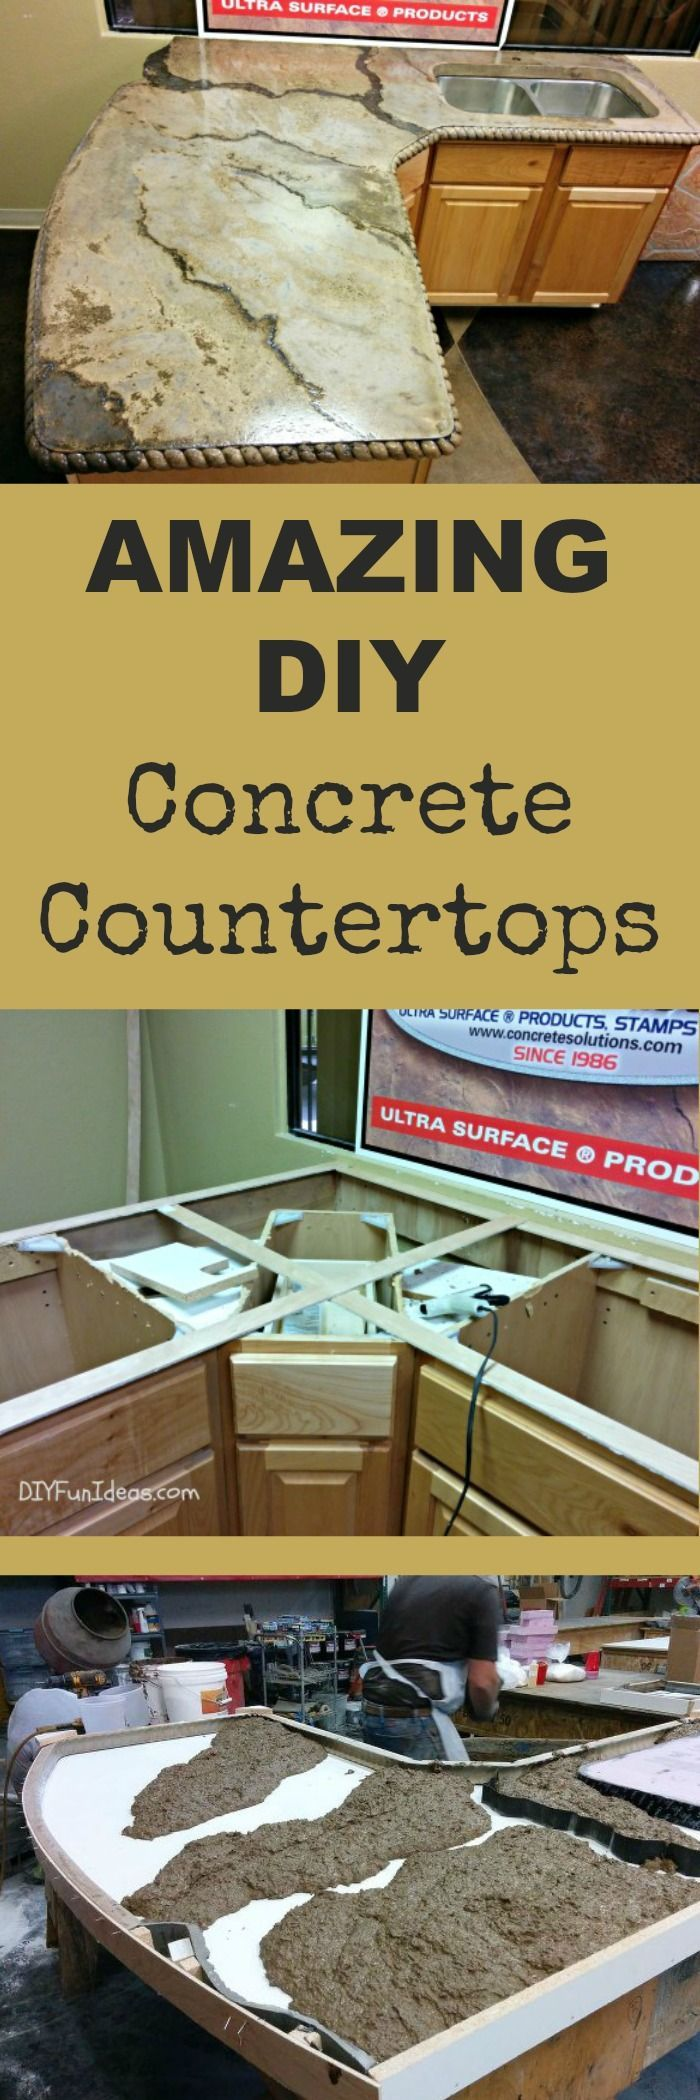 70 best Concrete Countertops images on Pinterest | Kitchen, Diy ...